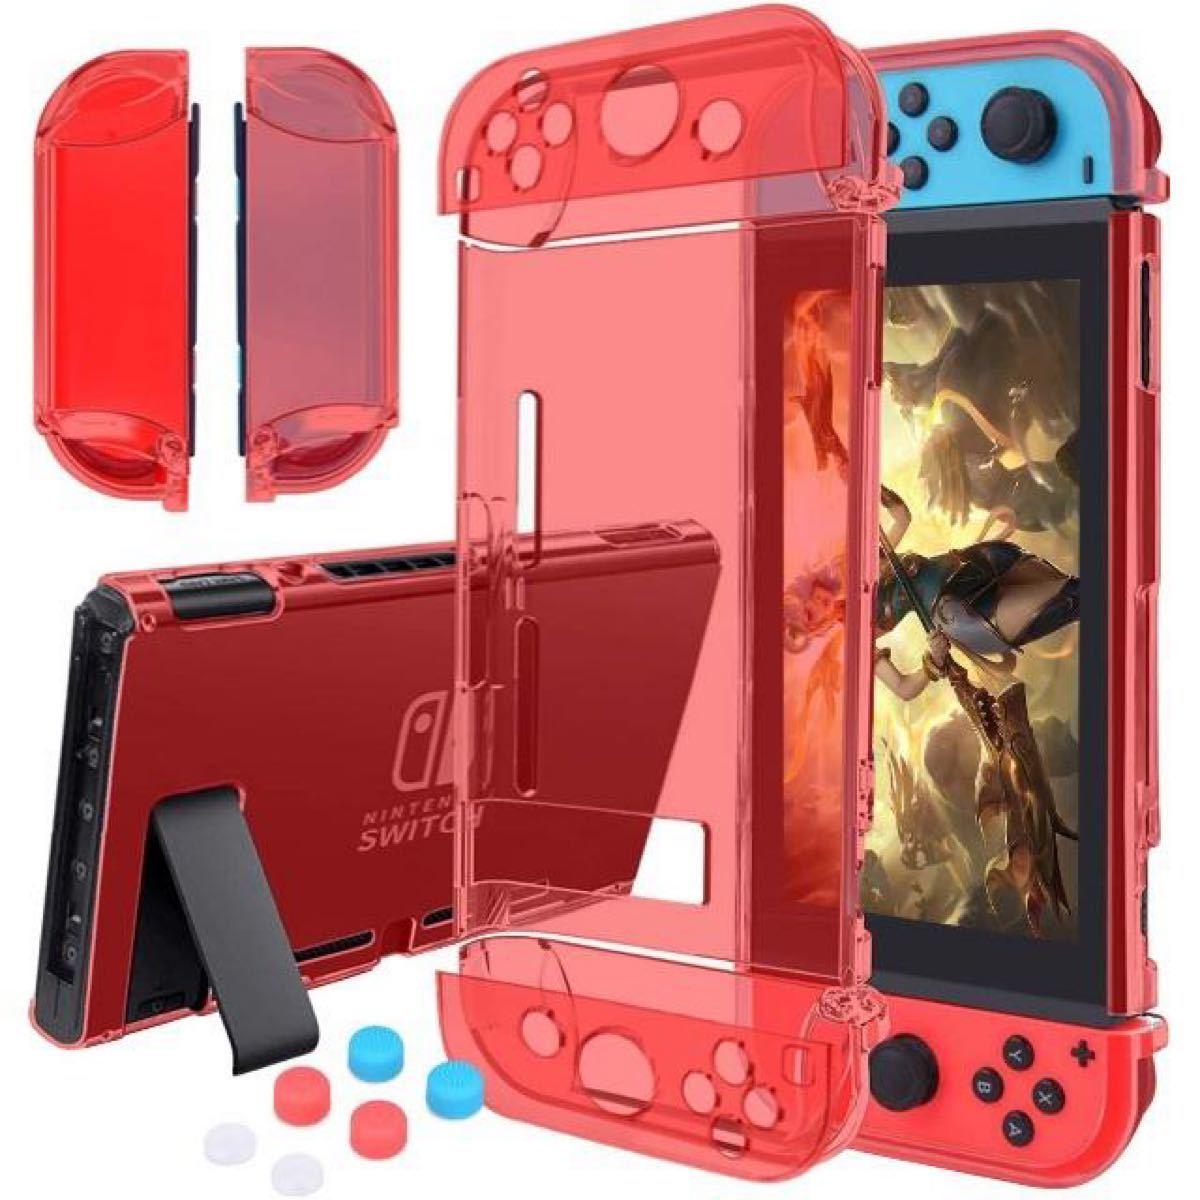 Nintendo Switch 保護フィルム 任天堂スイッチ 強化ガラス